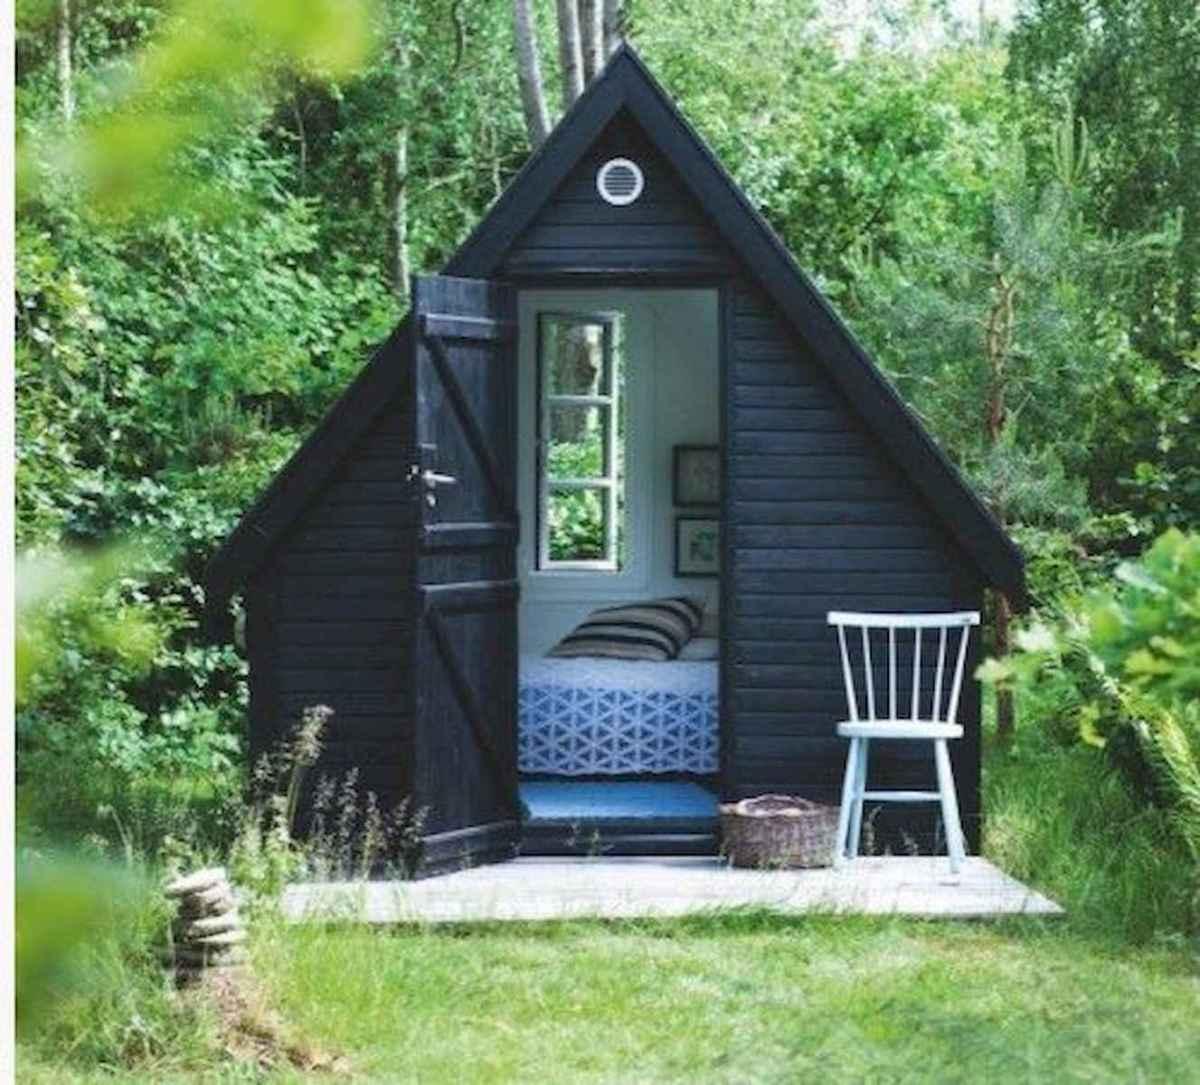 70 Suprising Small Log Cabin Homes Design Ideas (33)